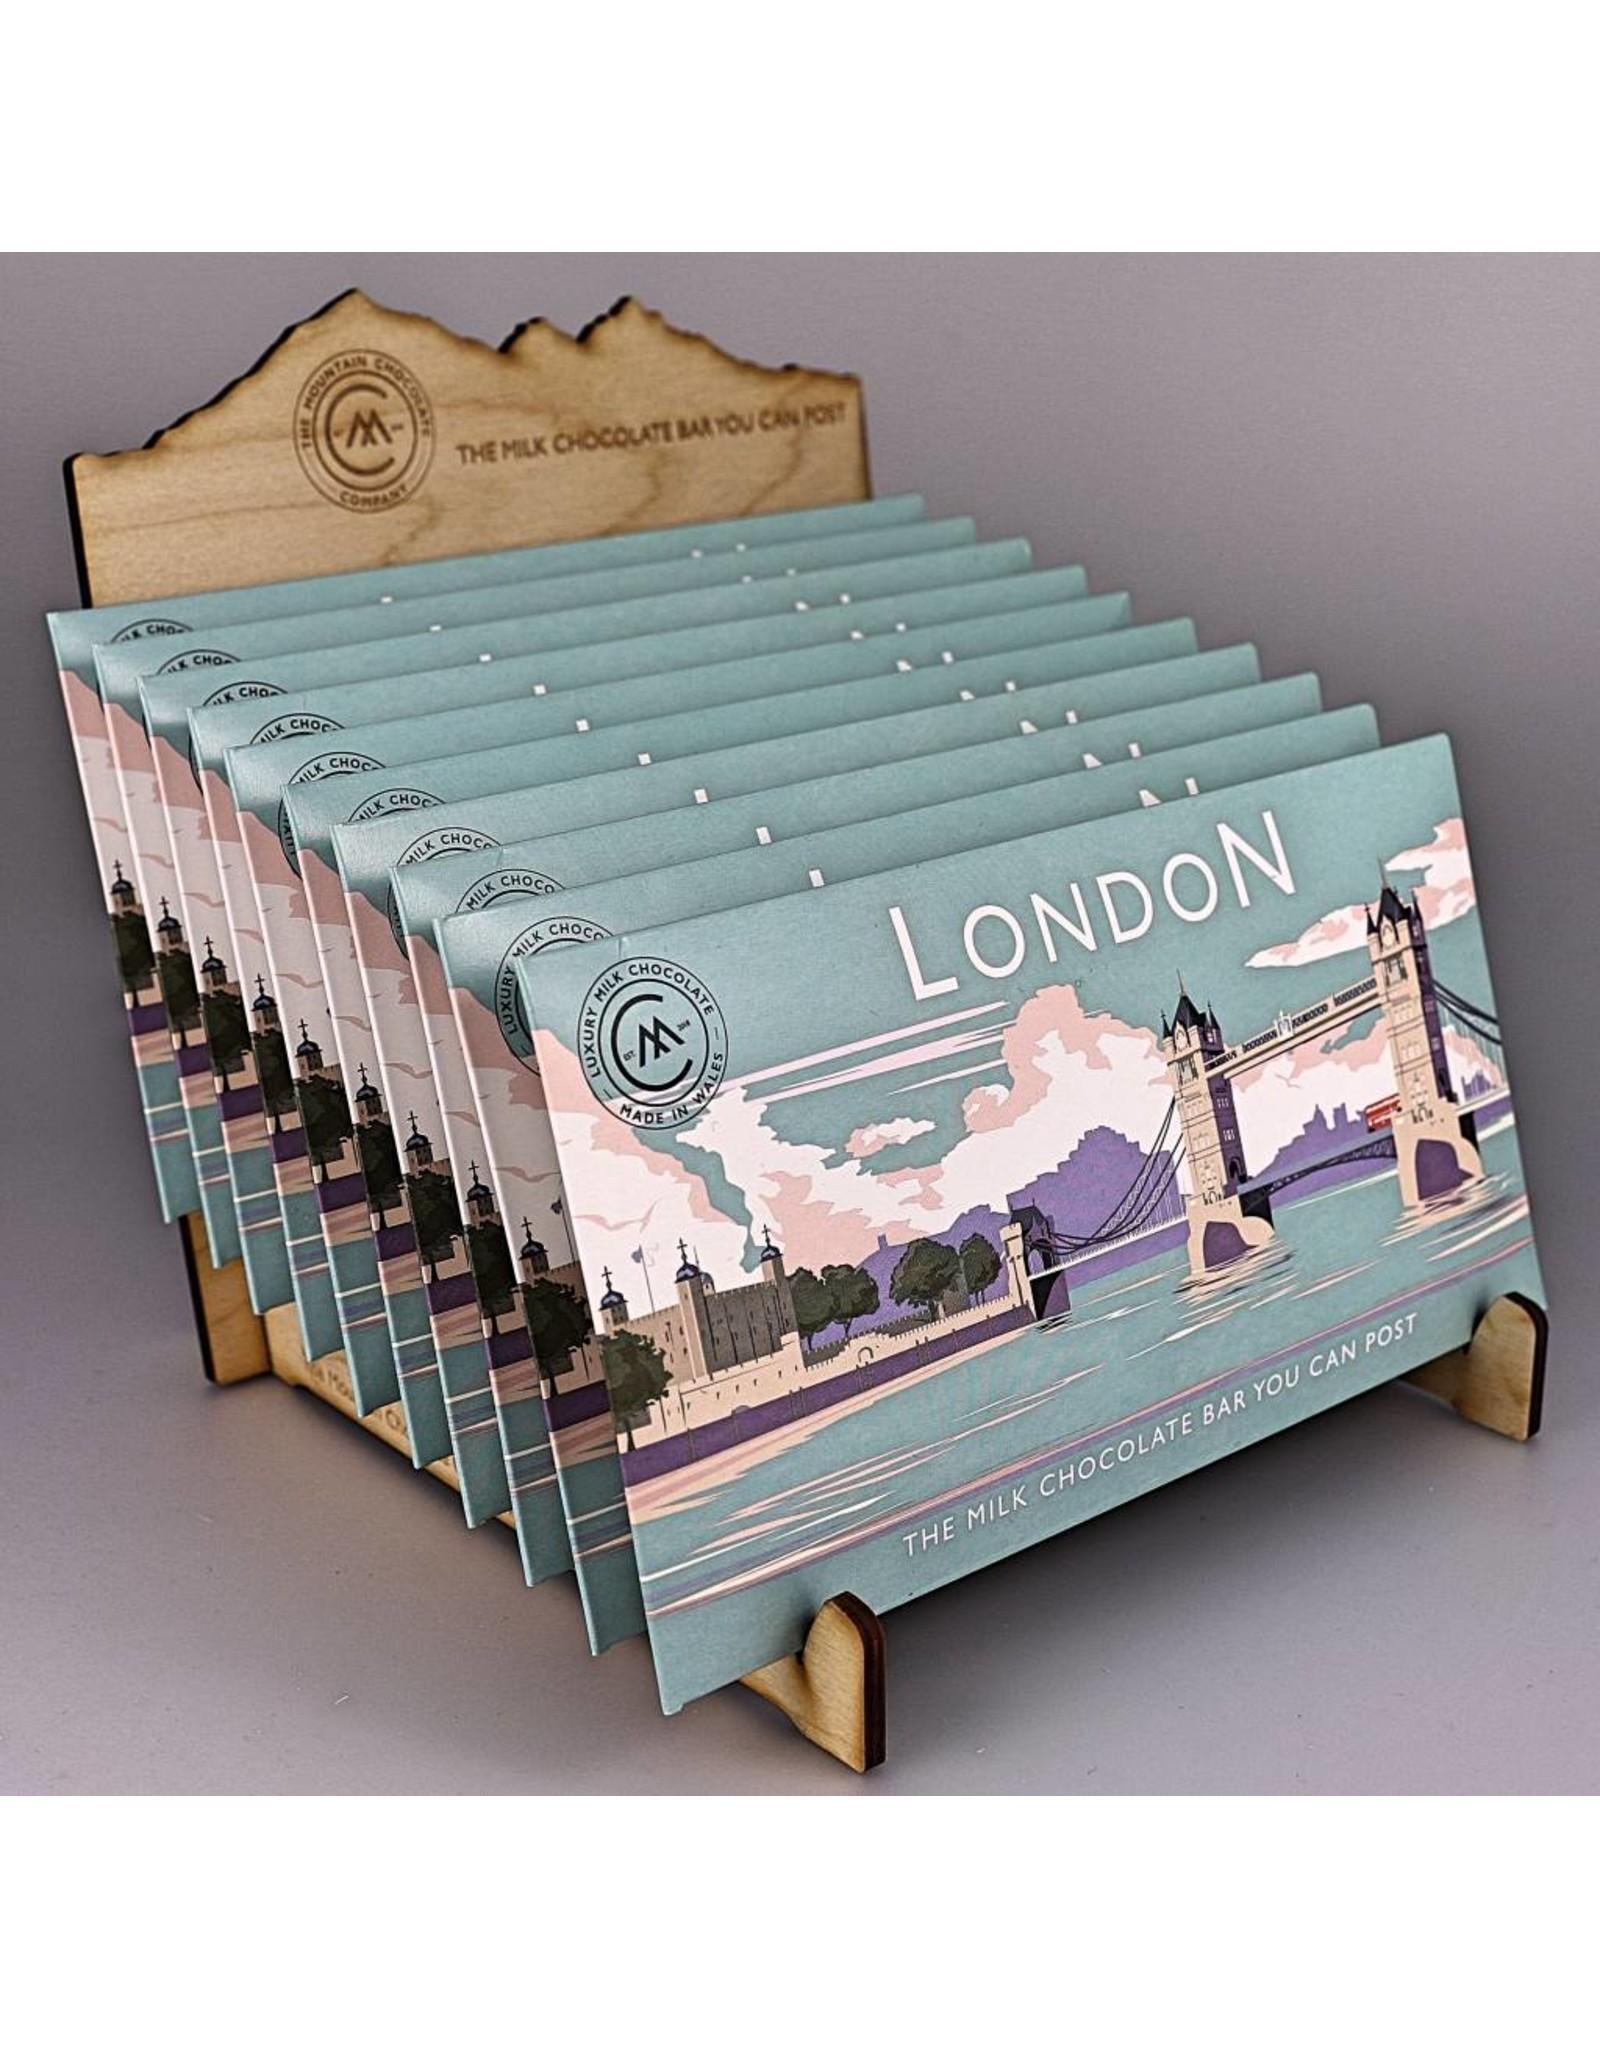 The Chocolate Bar You Can Post -Tower Bridge - Trade Box